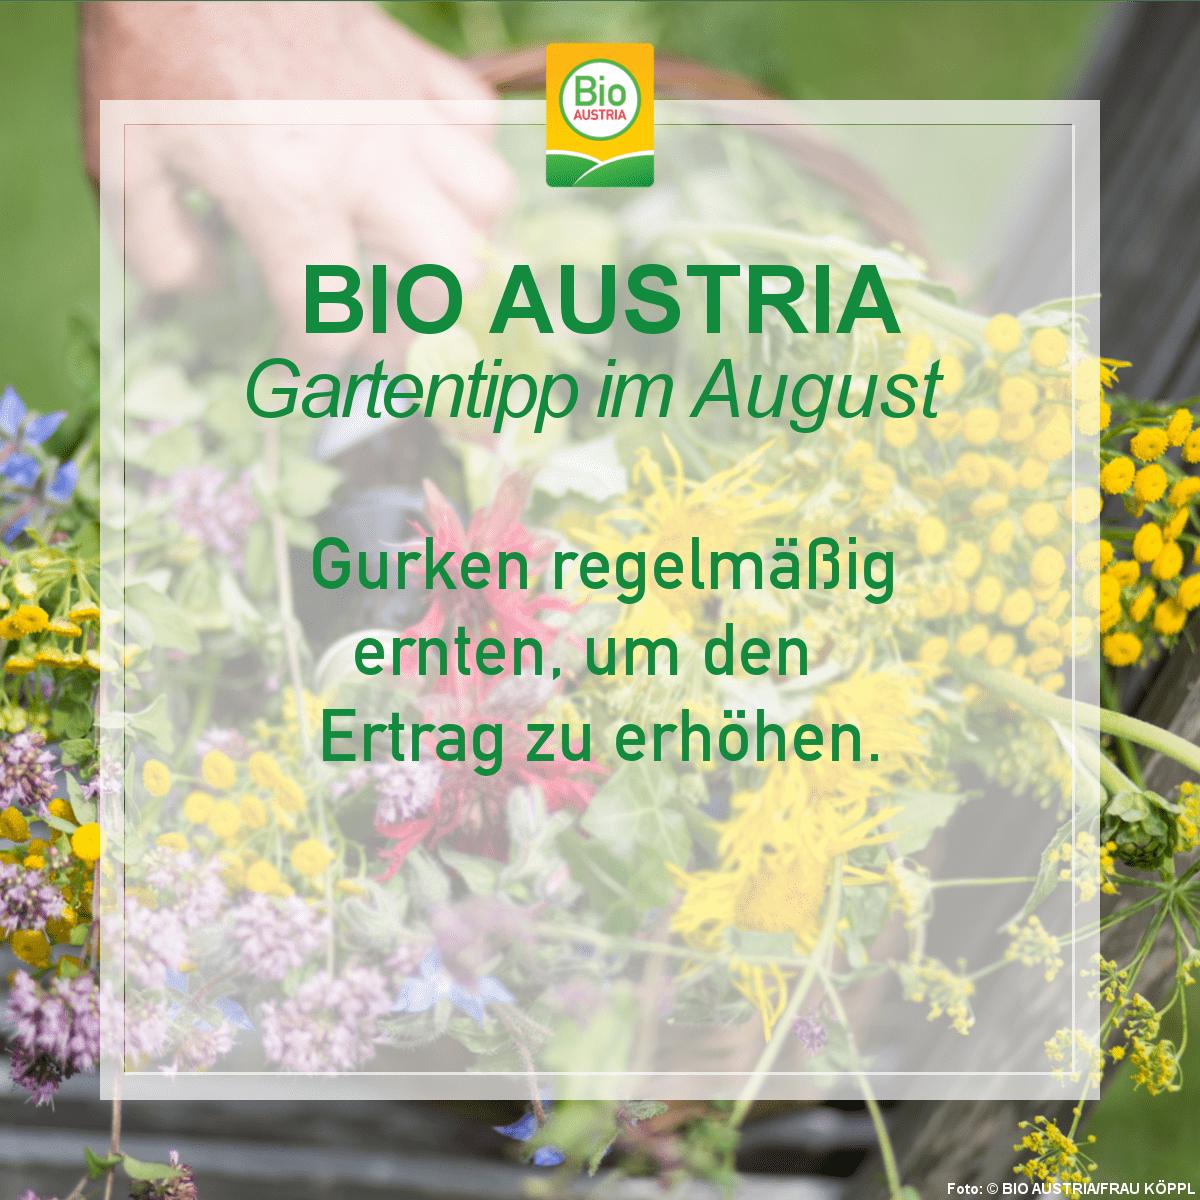 BIO AUSTRIA Gartentipp Gurken regelmäßig ernten